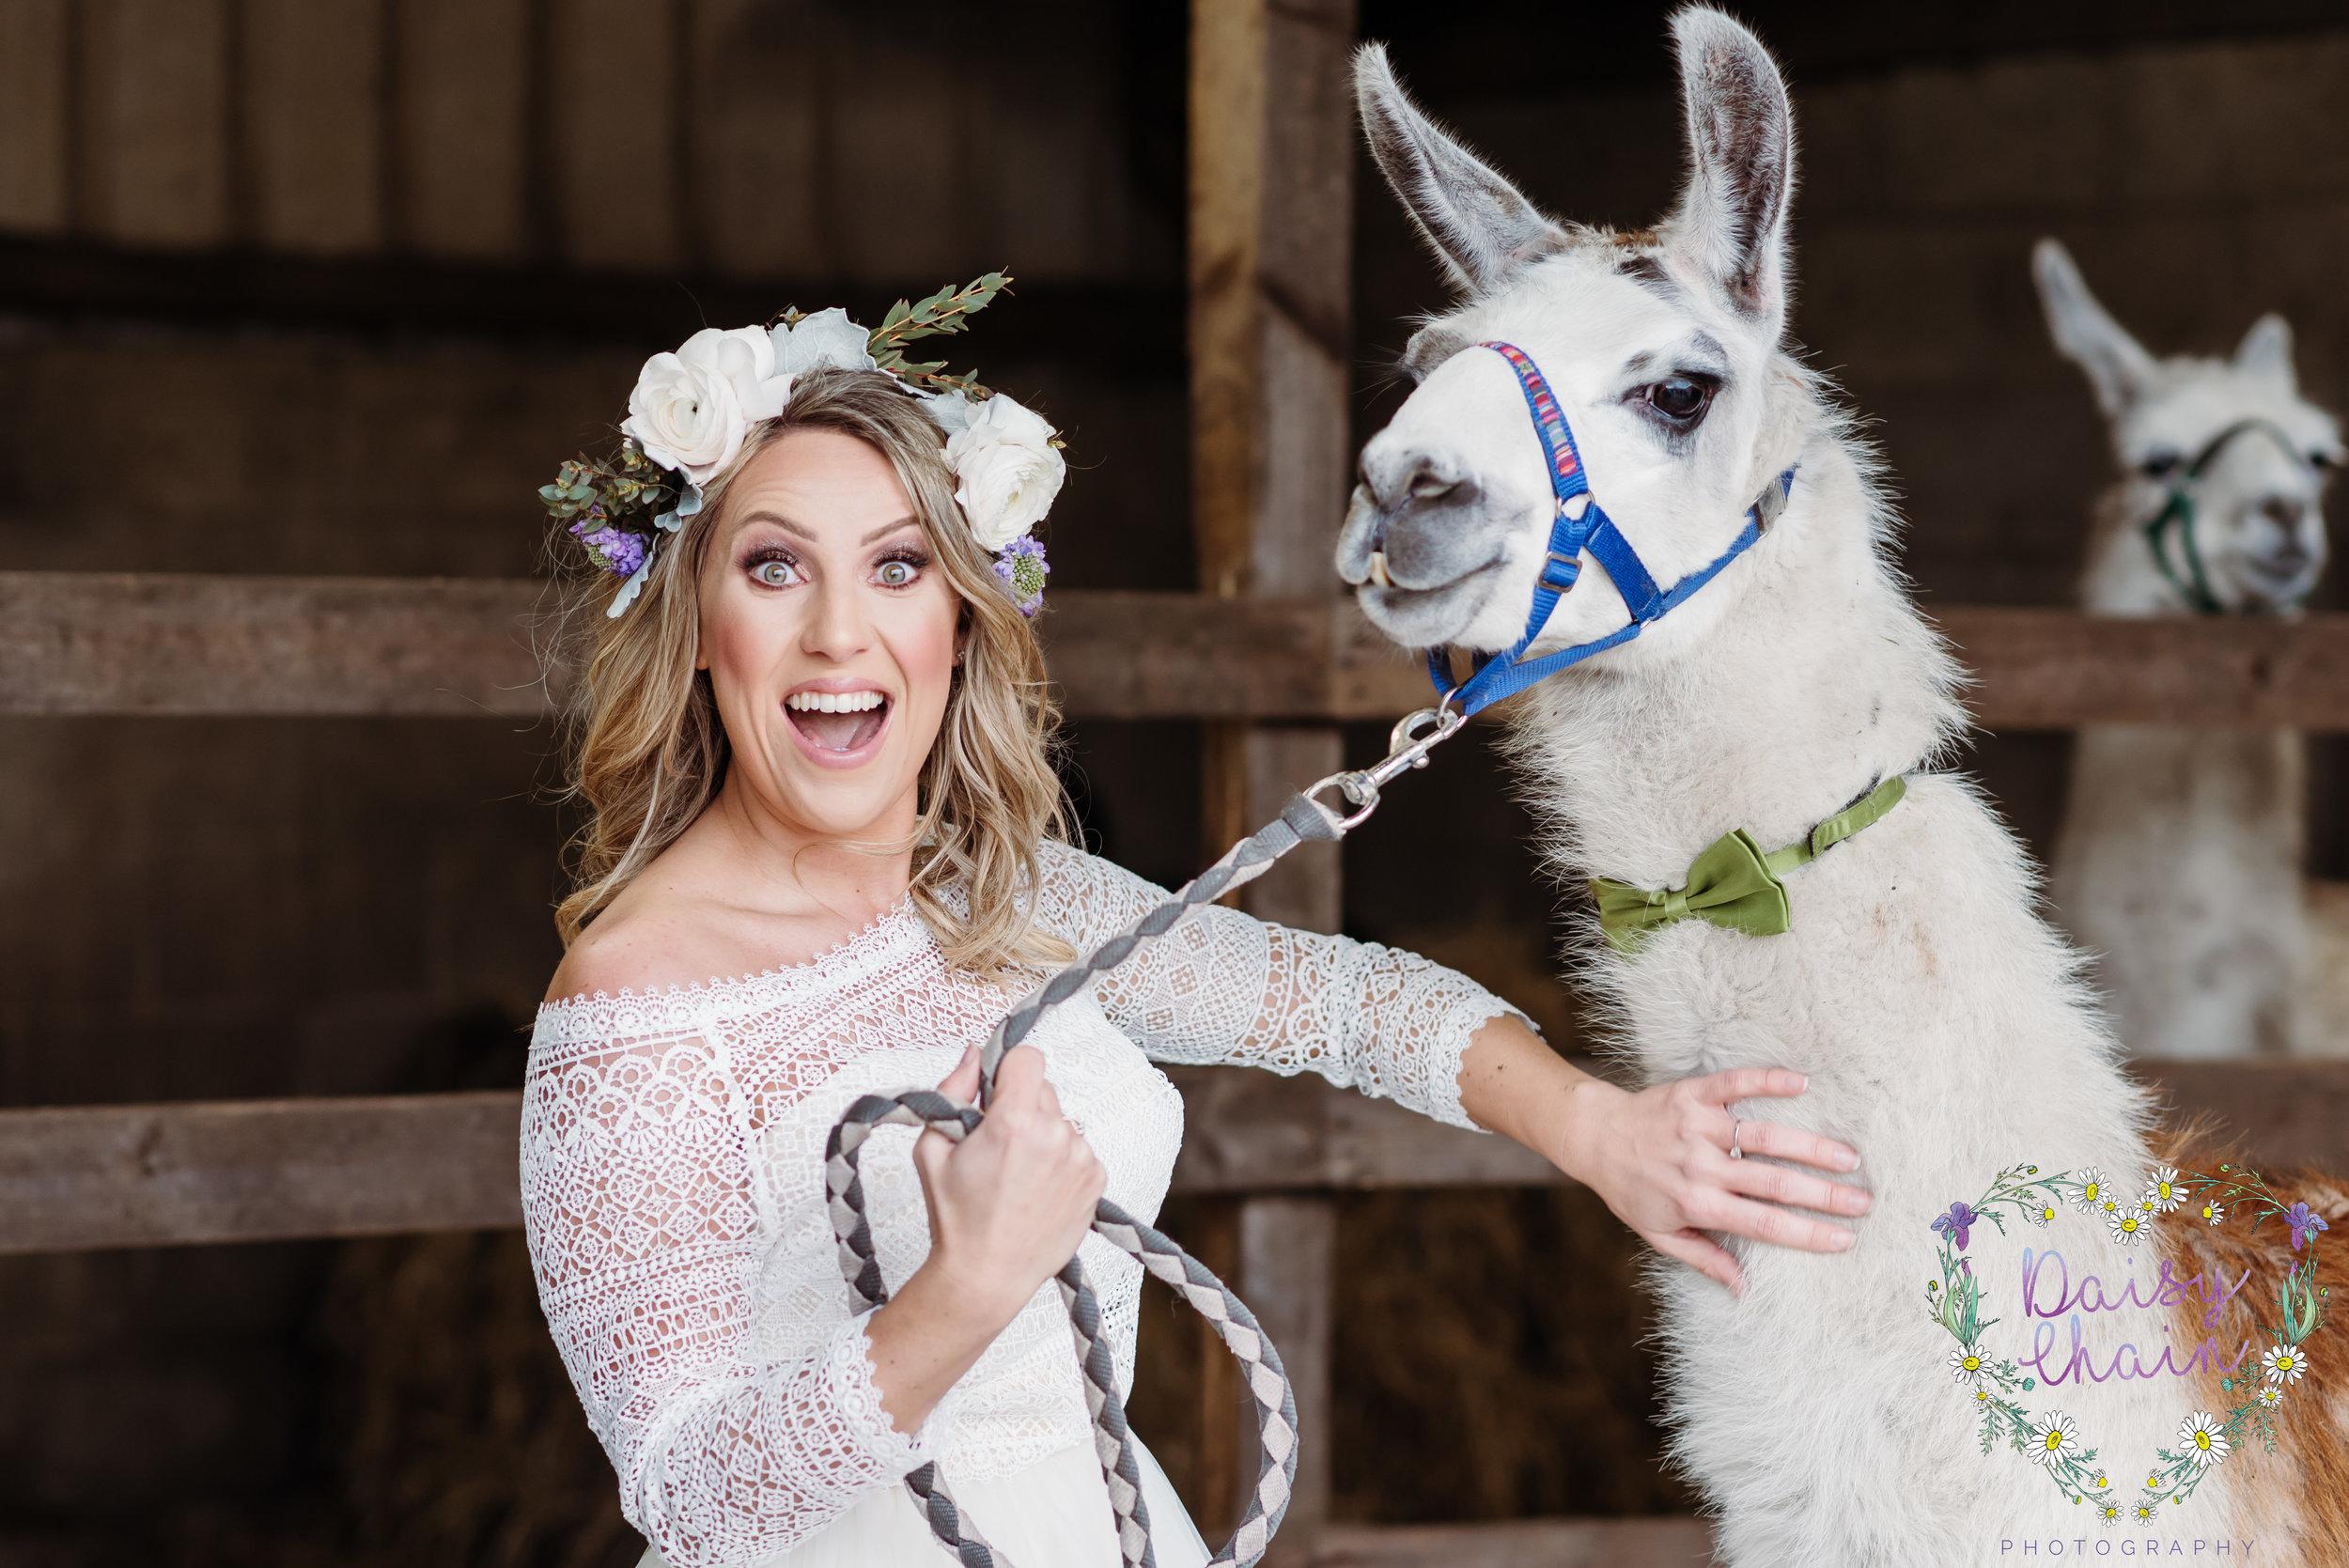 Outdoors wedding with Llamas